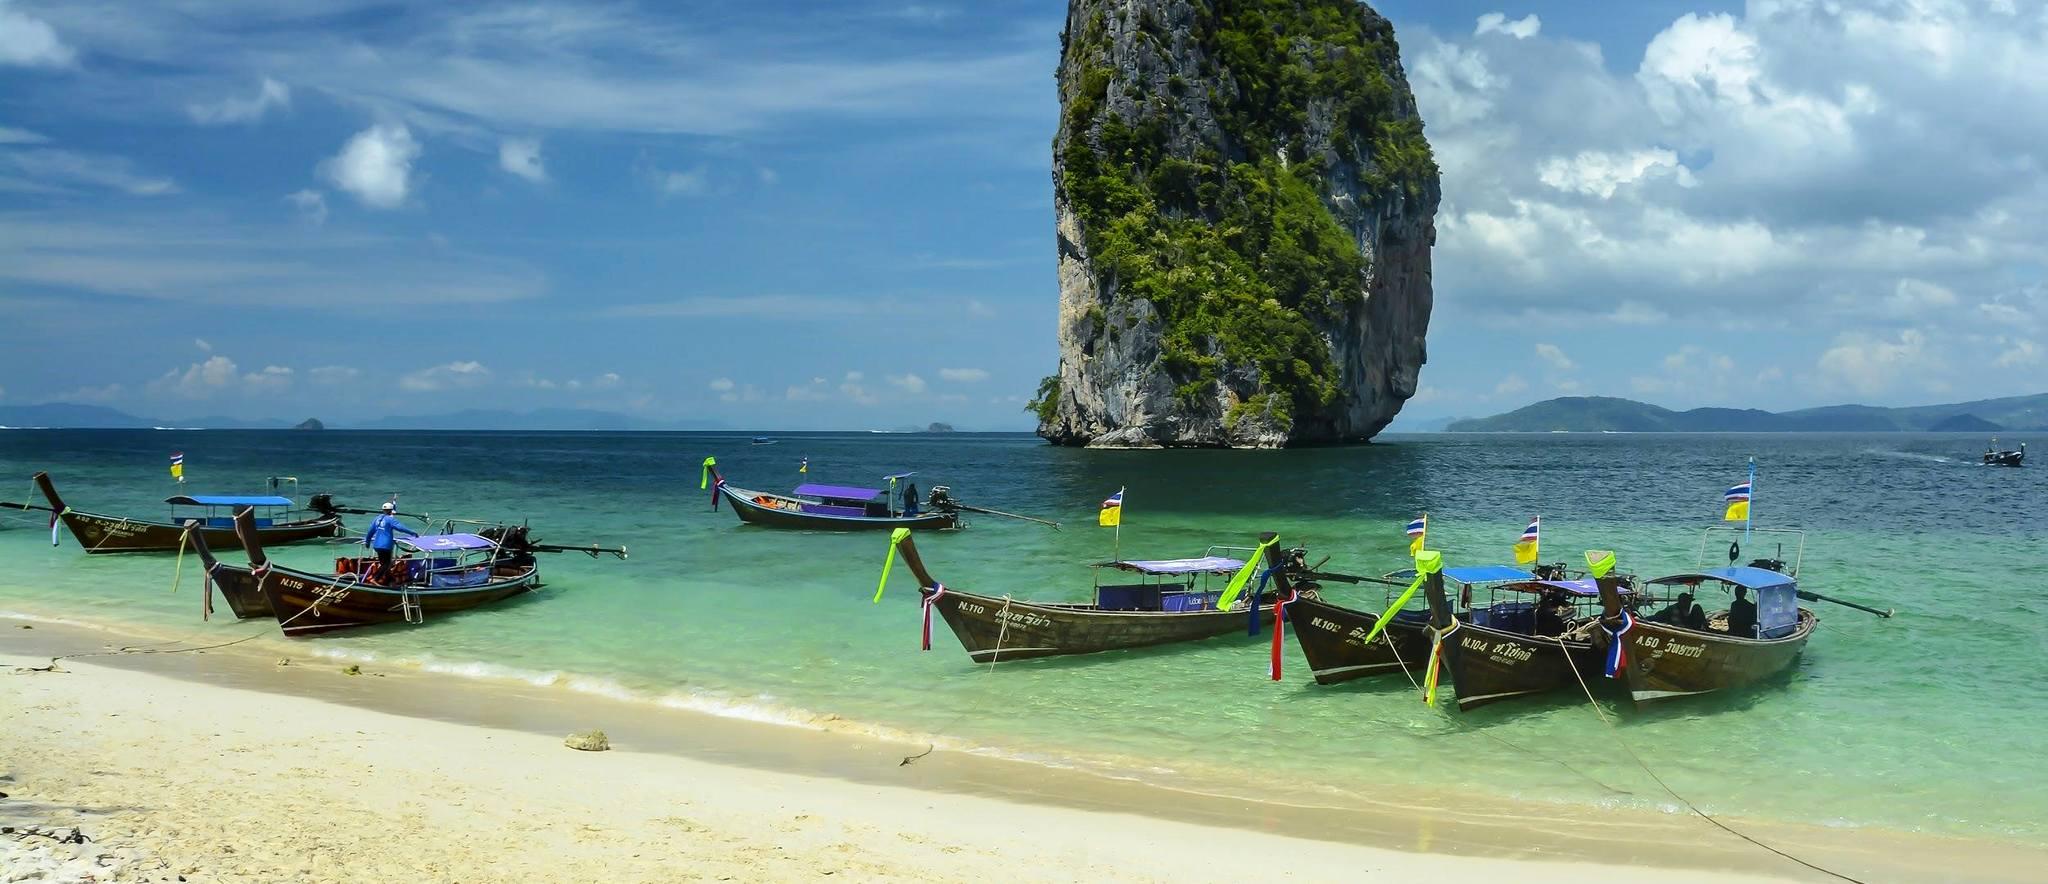 Asian beach holiday